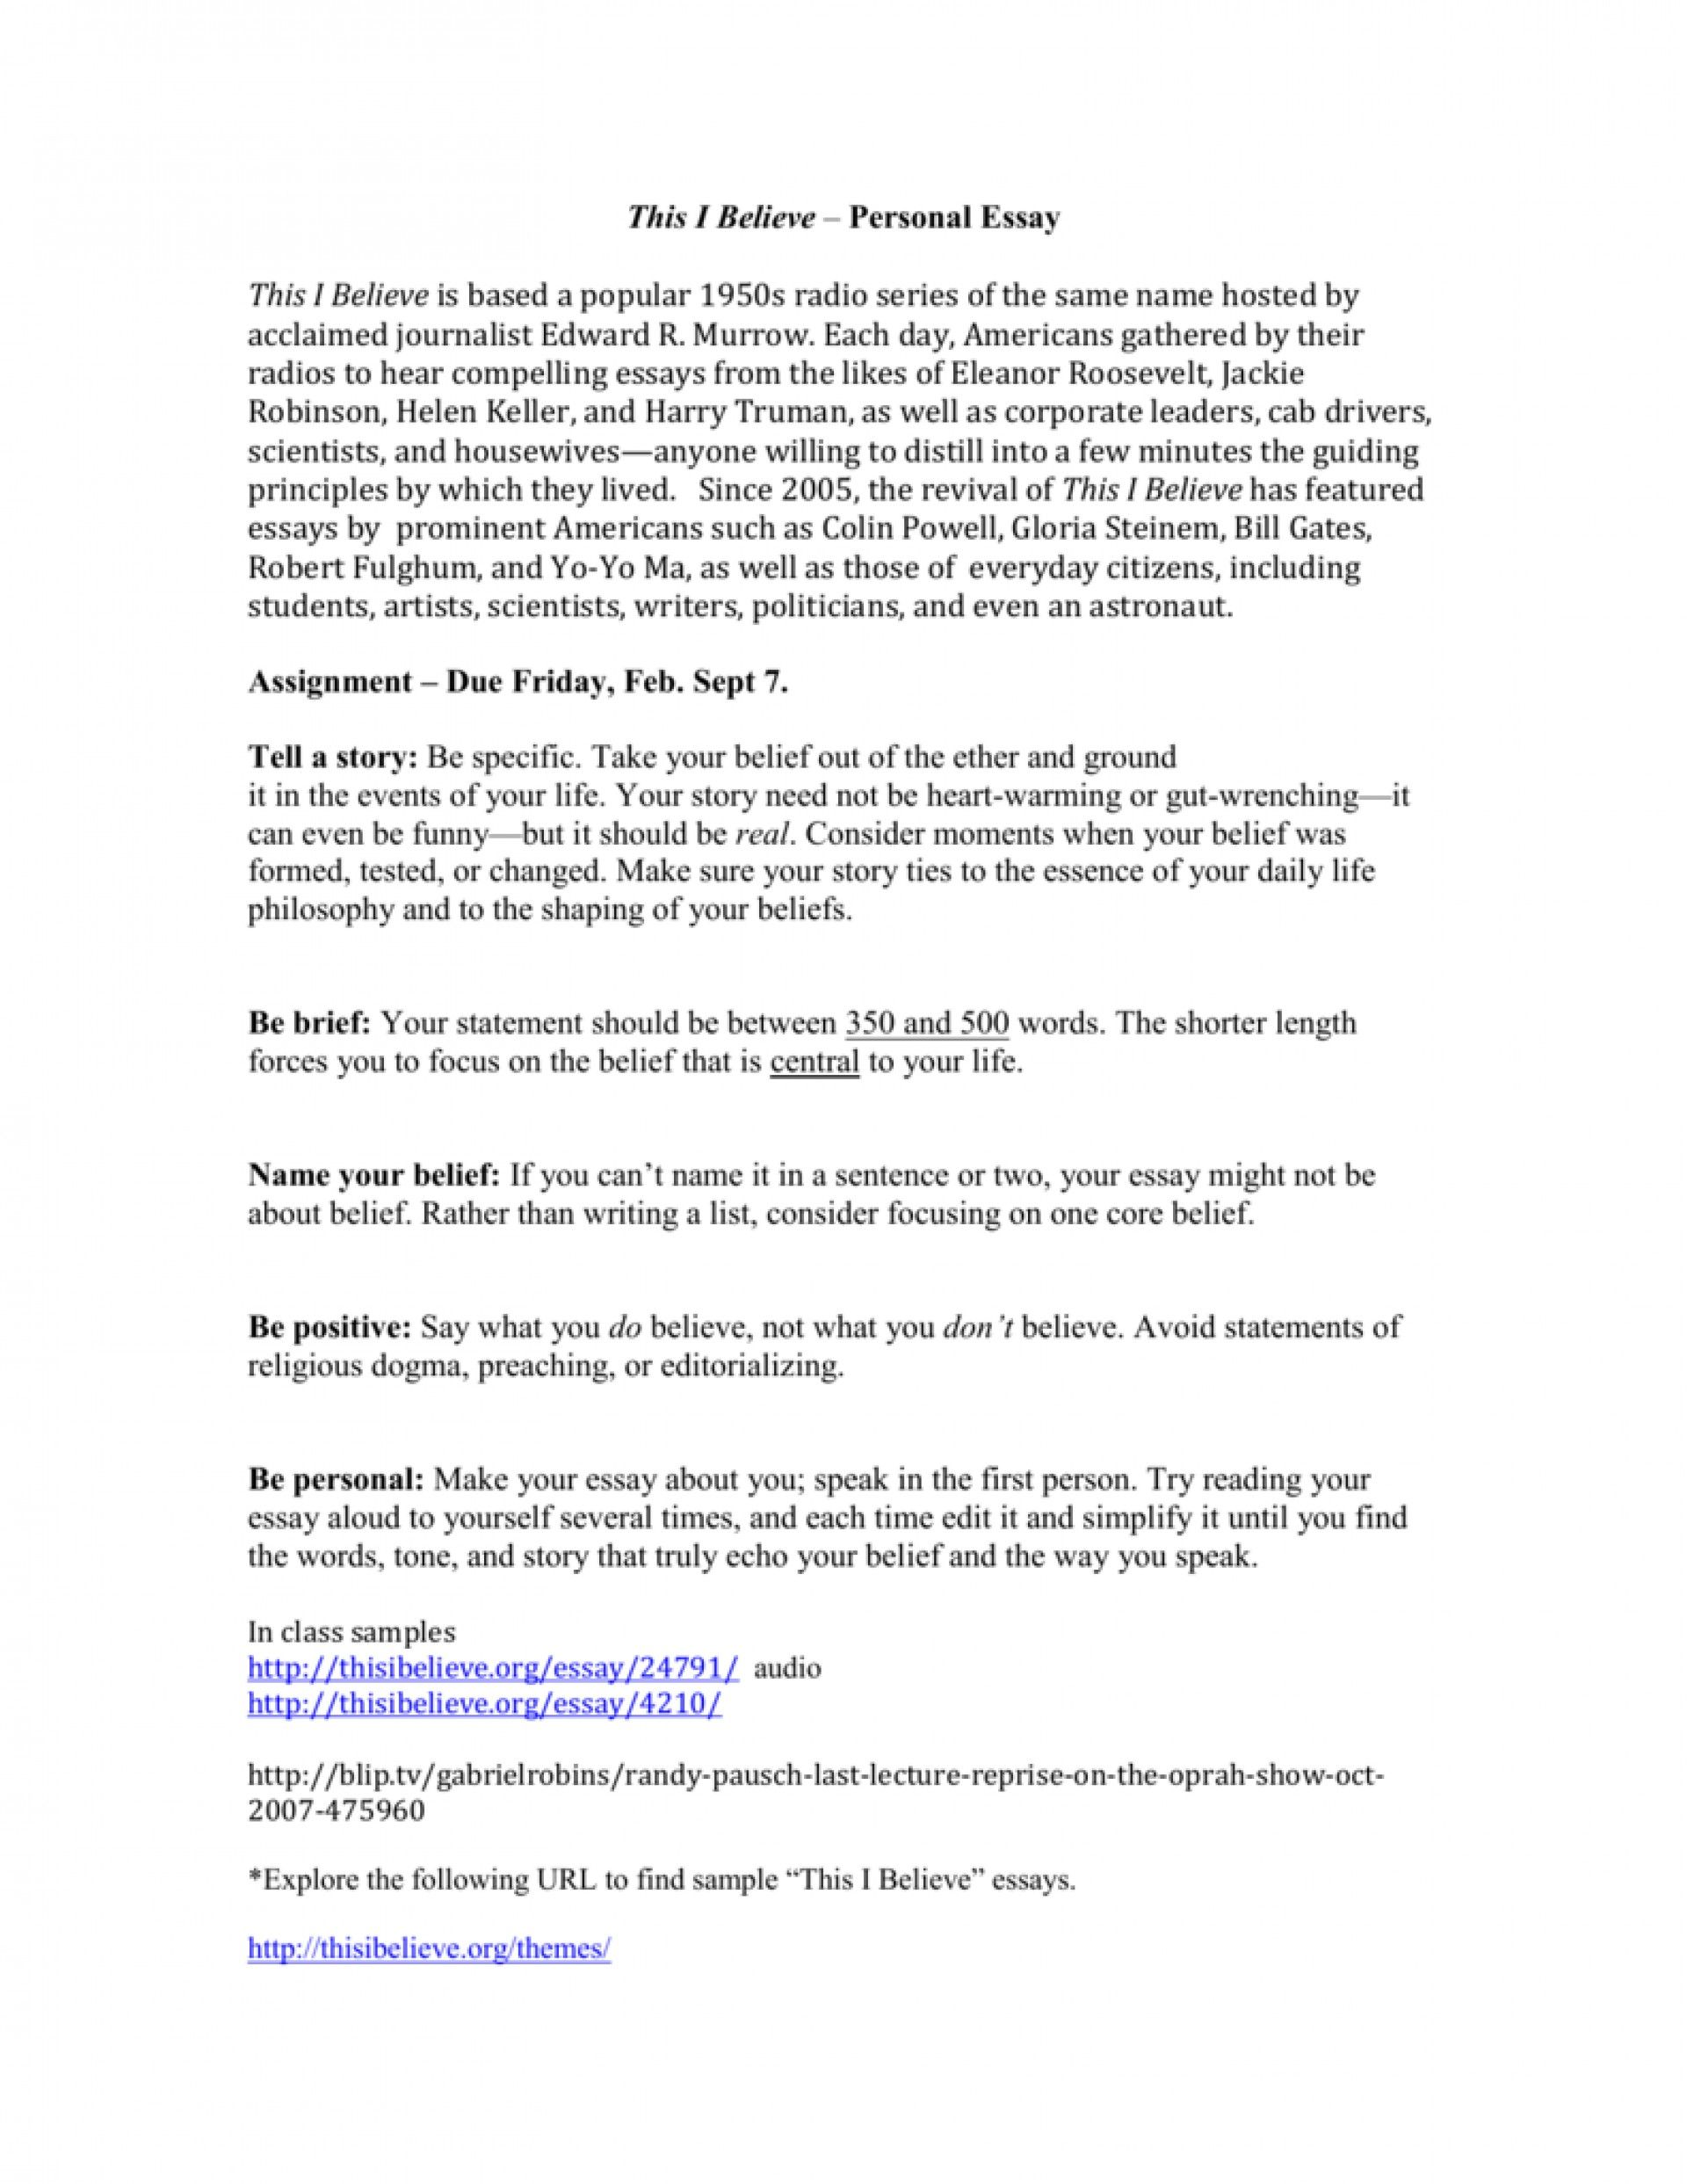 001 Thisibelieve Org Essays Featured 009016648 1 Essay Amazing Thisibelieve.org 1920